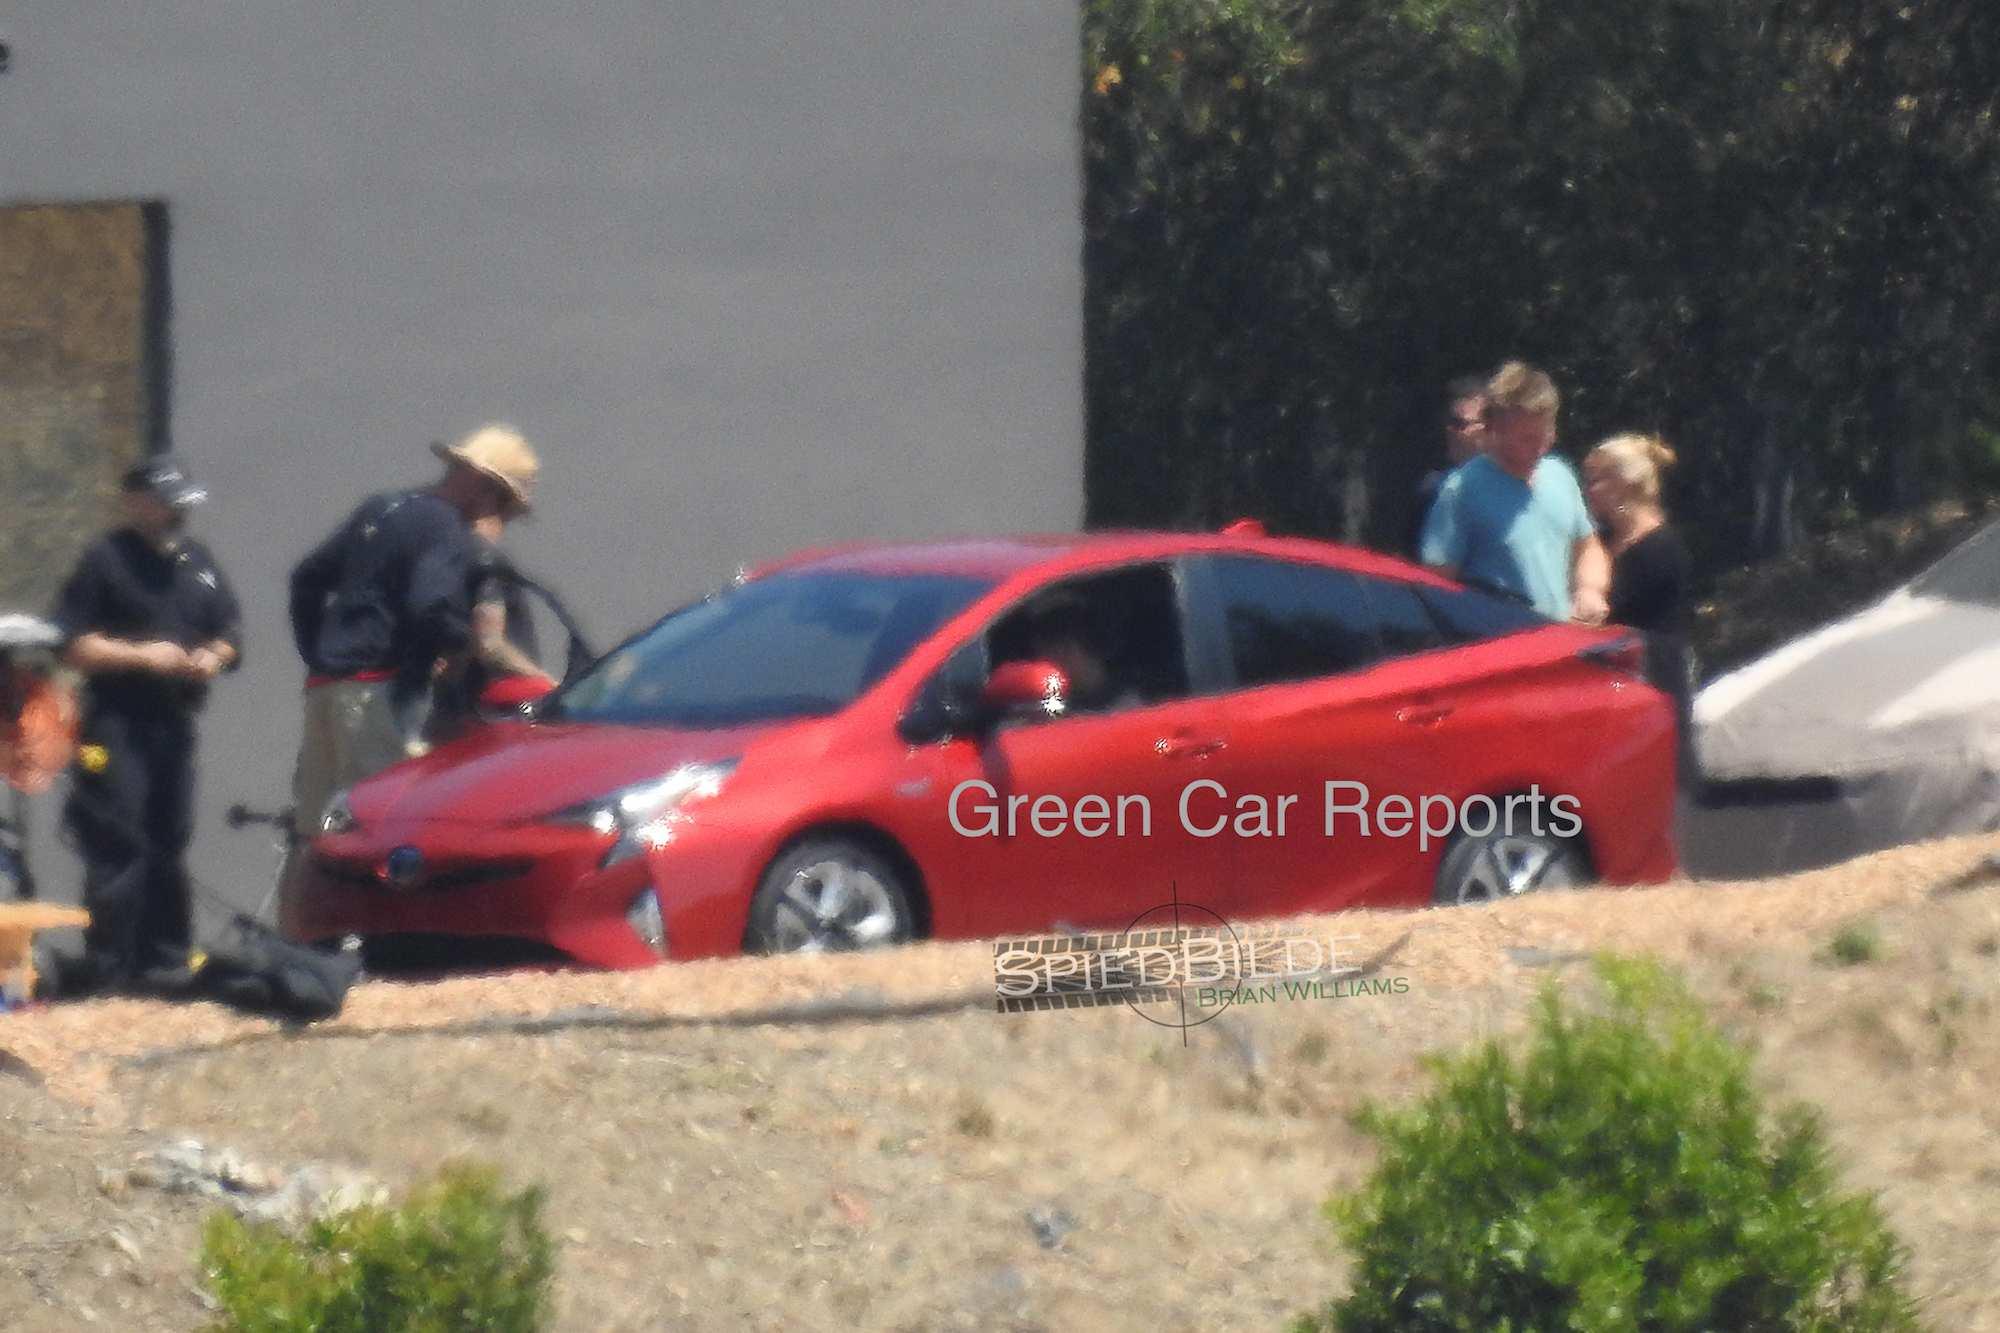 33 New 2020 Spy Shots Toyota Prius Specs for 2020 Spy Shots Toyota Prius